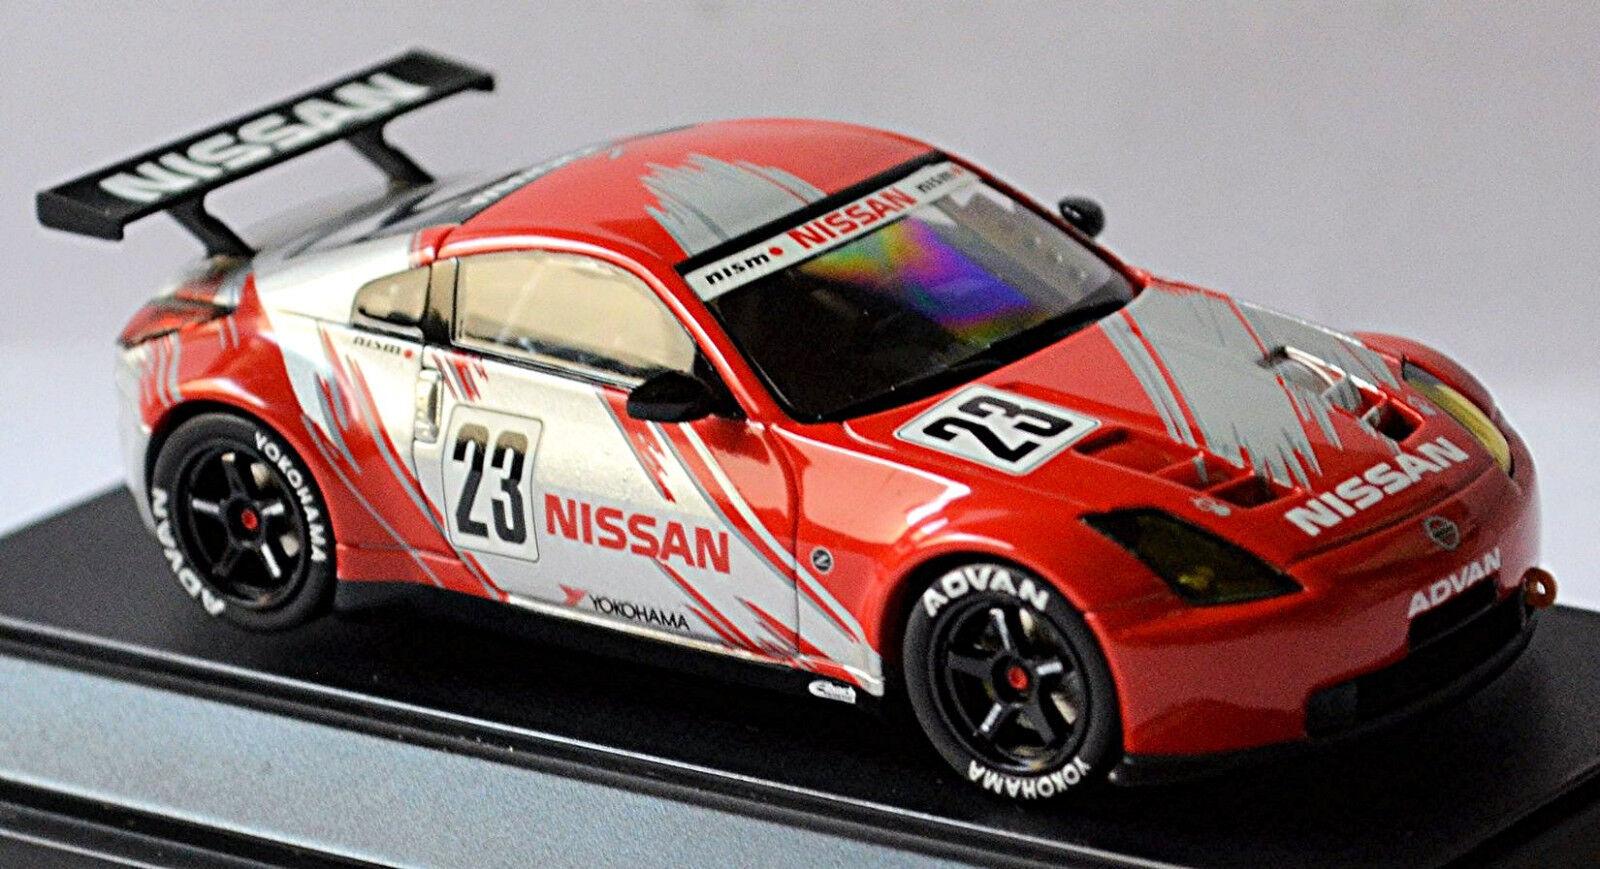 Nissan Fairlady Z Gt Nismo Course Prototyp Silber rot 1 43 Ebbro